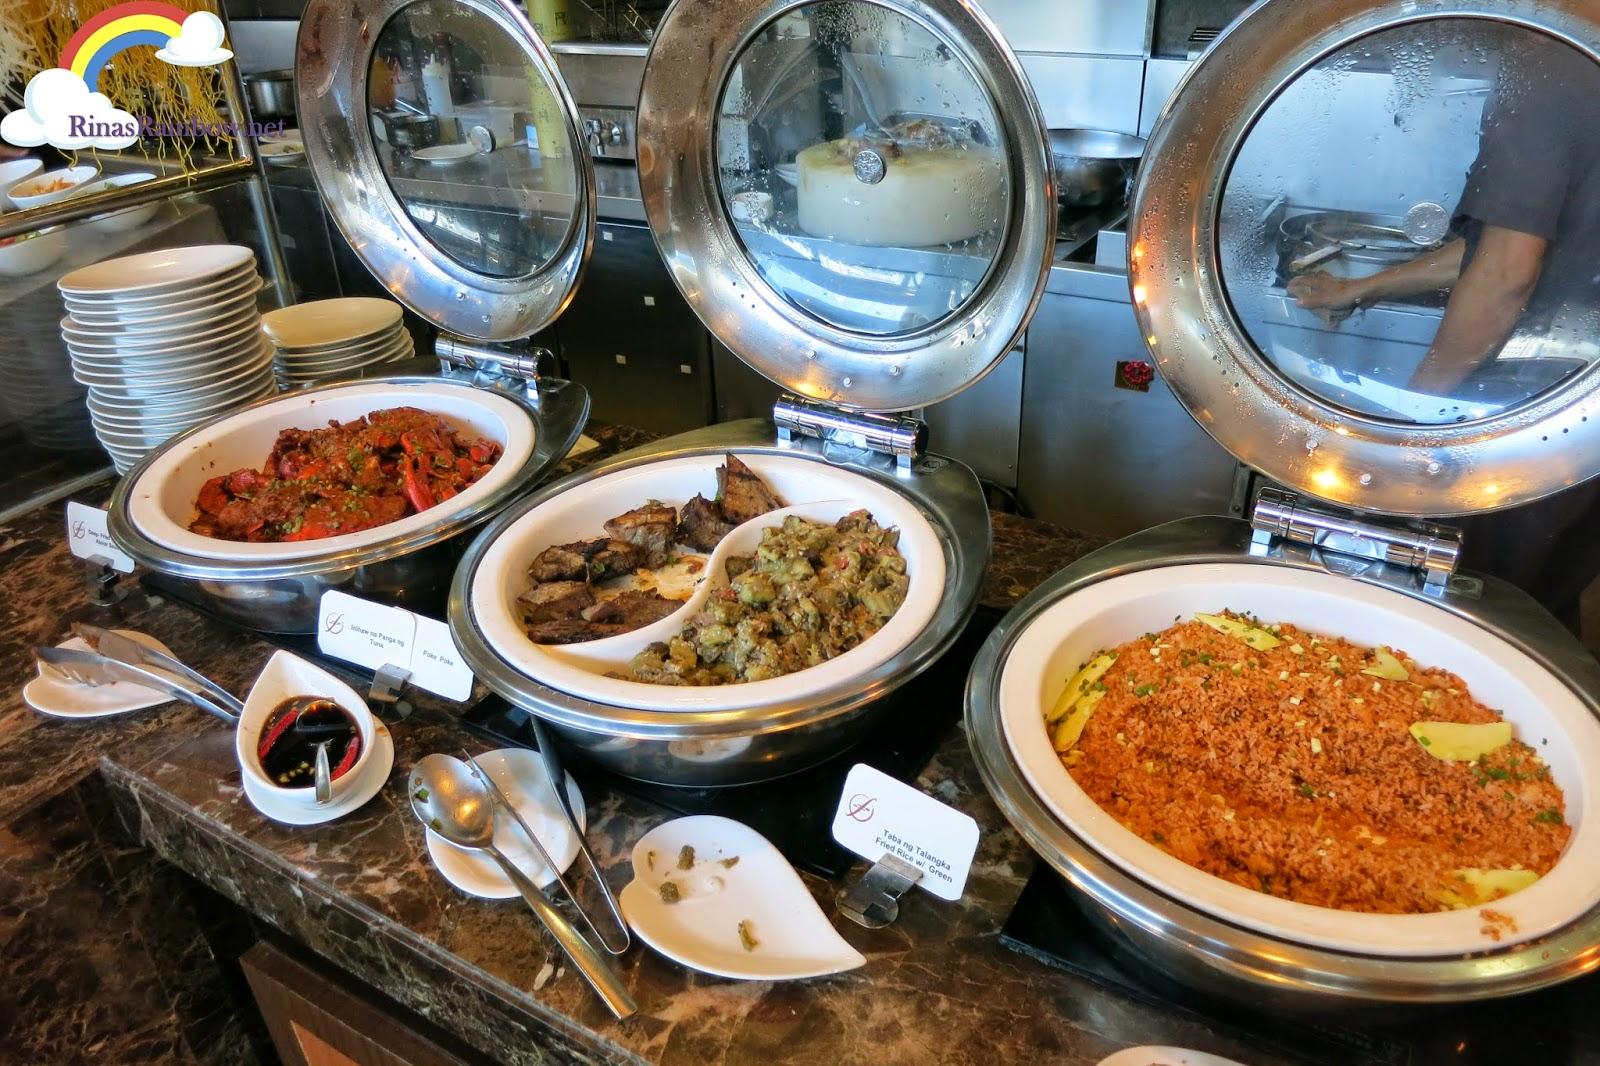 f1 hotel buffet